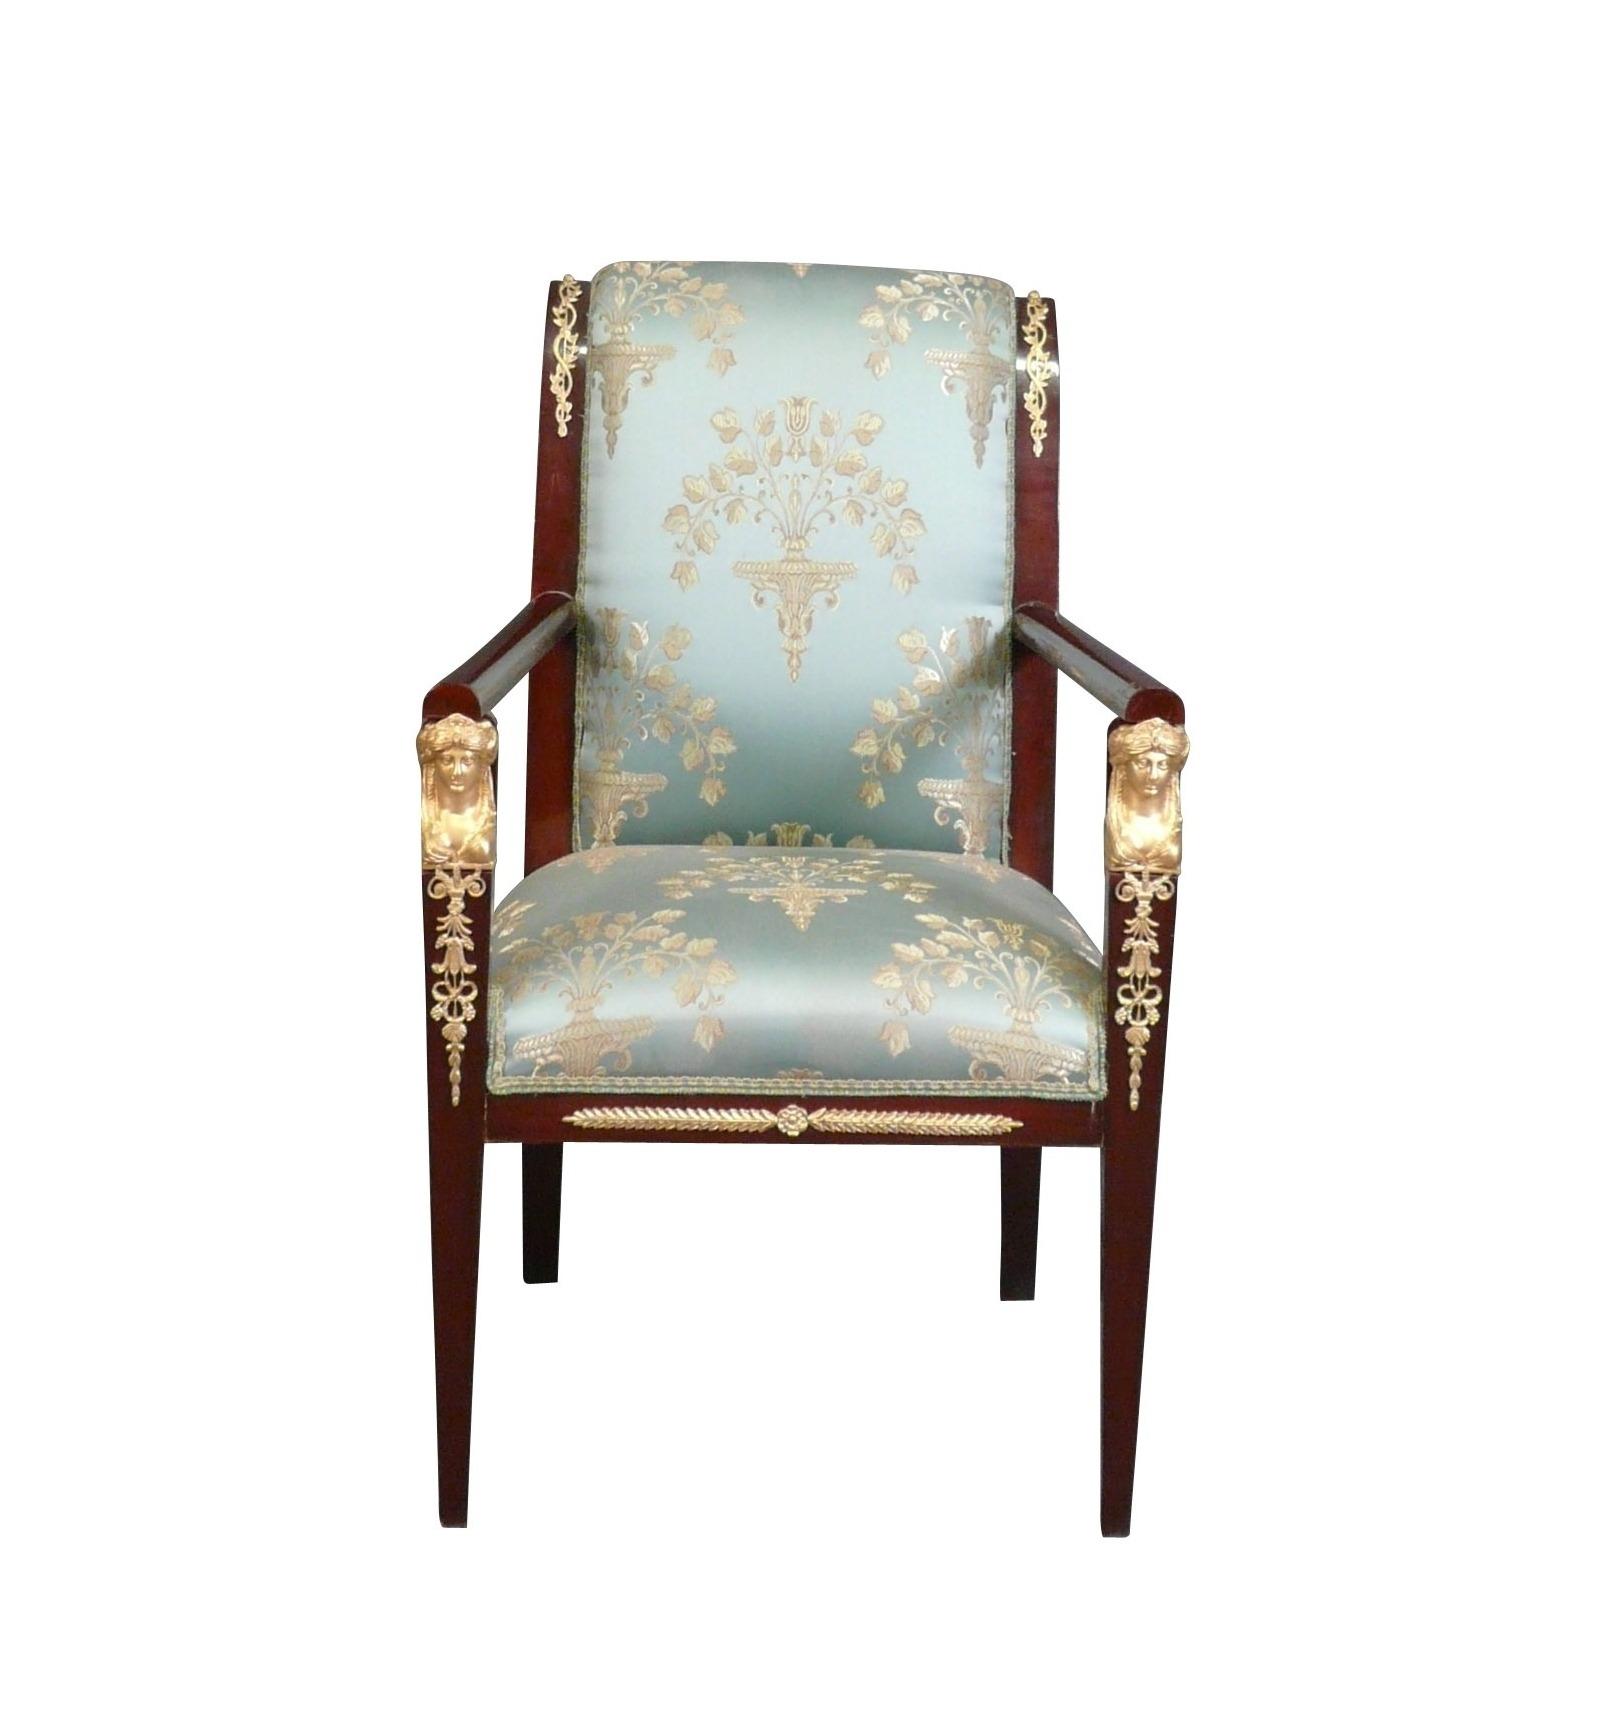 fauteuil empire rev tu d 39 un tissu satin mobilier de style. Black Bedroom Furniture Sets. Home Design Ideas